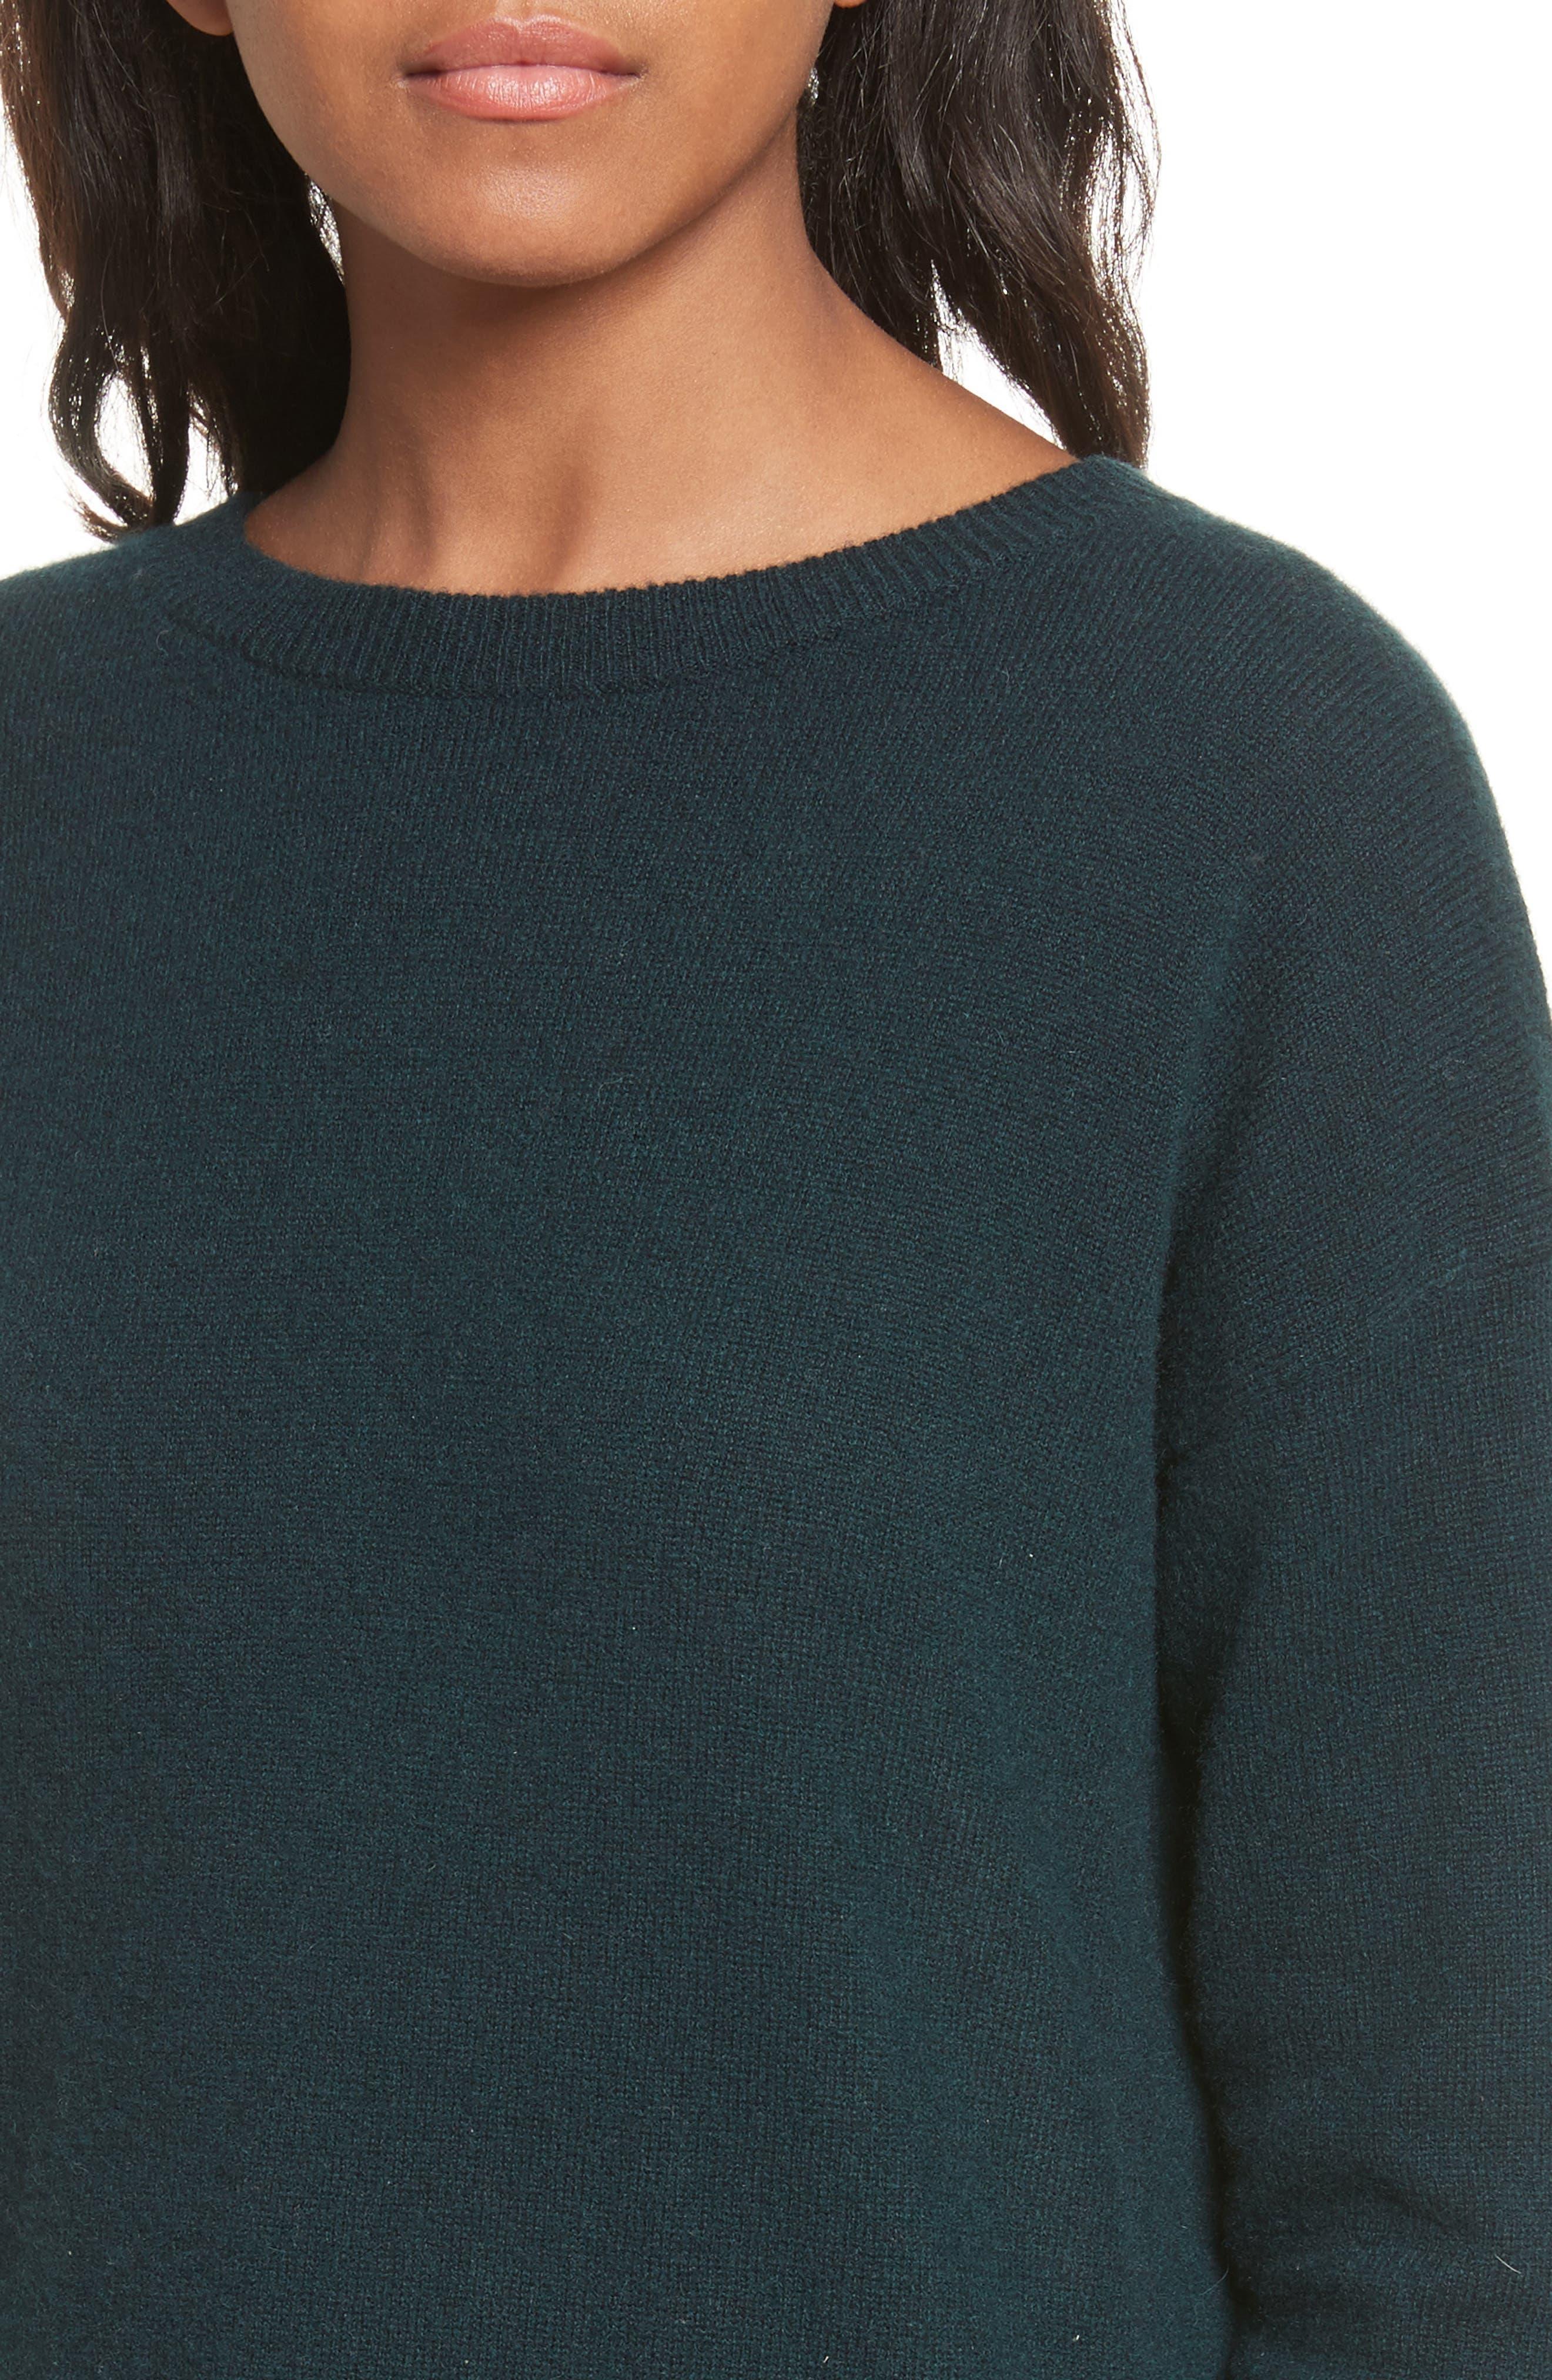 Velvet Tie Cashmere Sweater,                             Alternate thumbnail 4, color,                             320